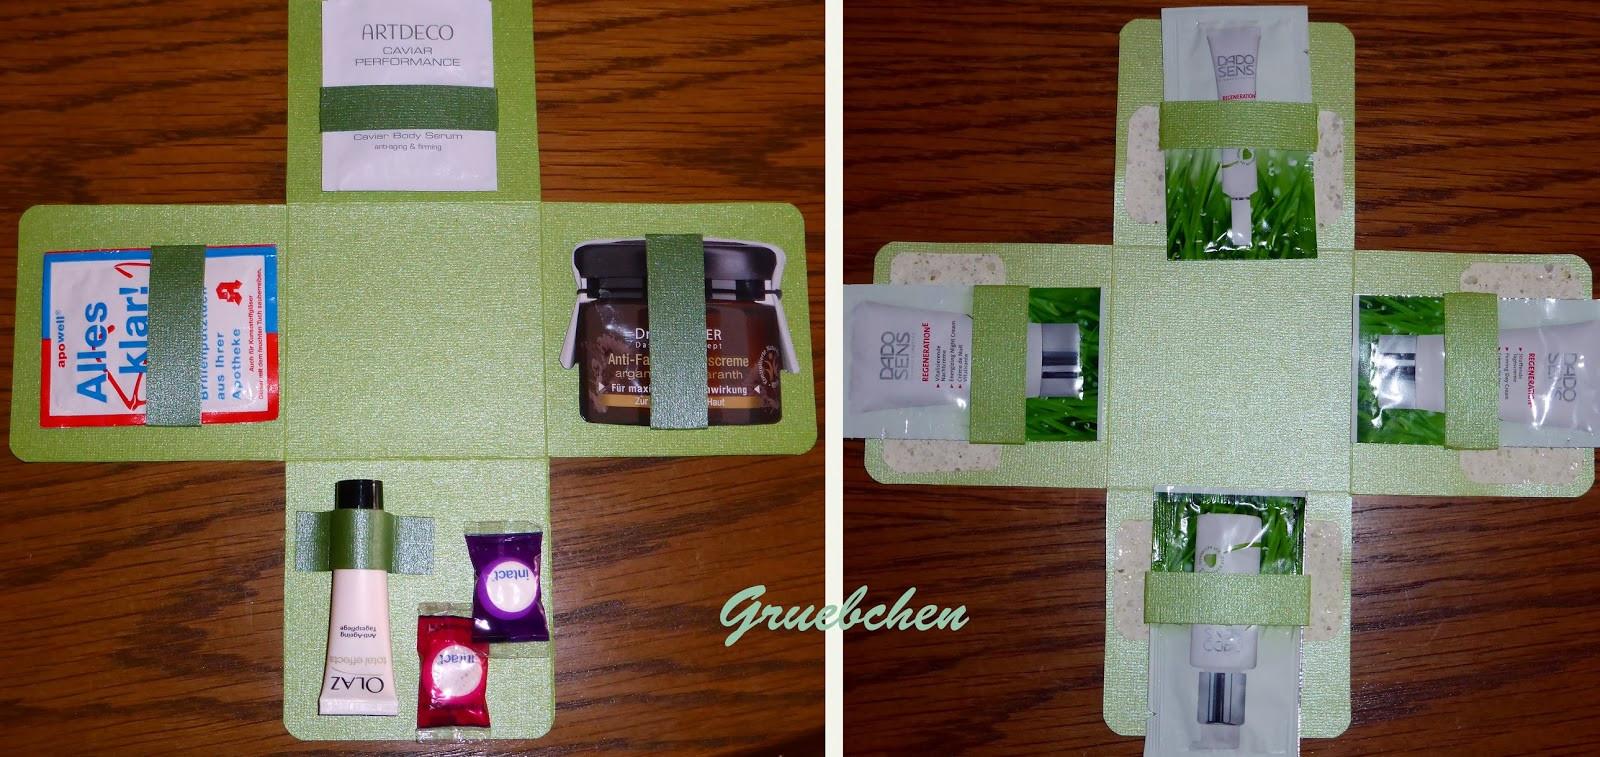 Diy Geburtstag  Grueb Style DIY Exploding Box zum 40 Geburtstag